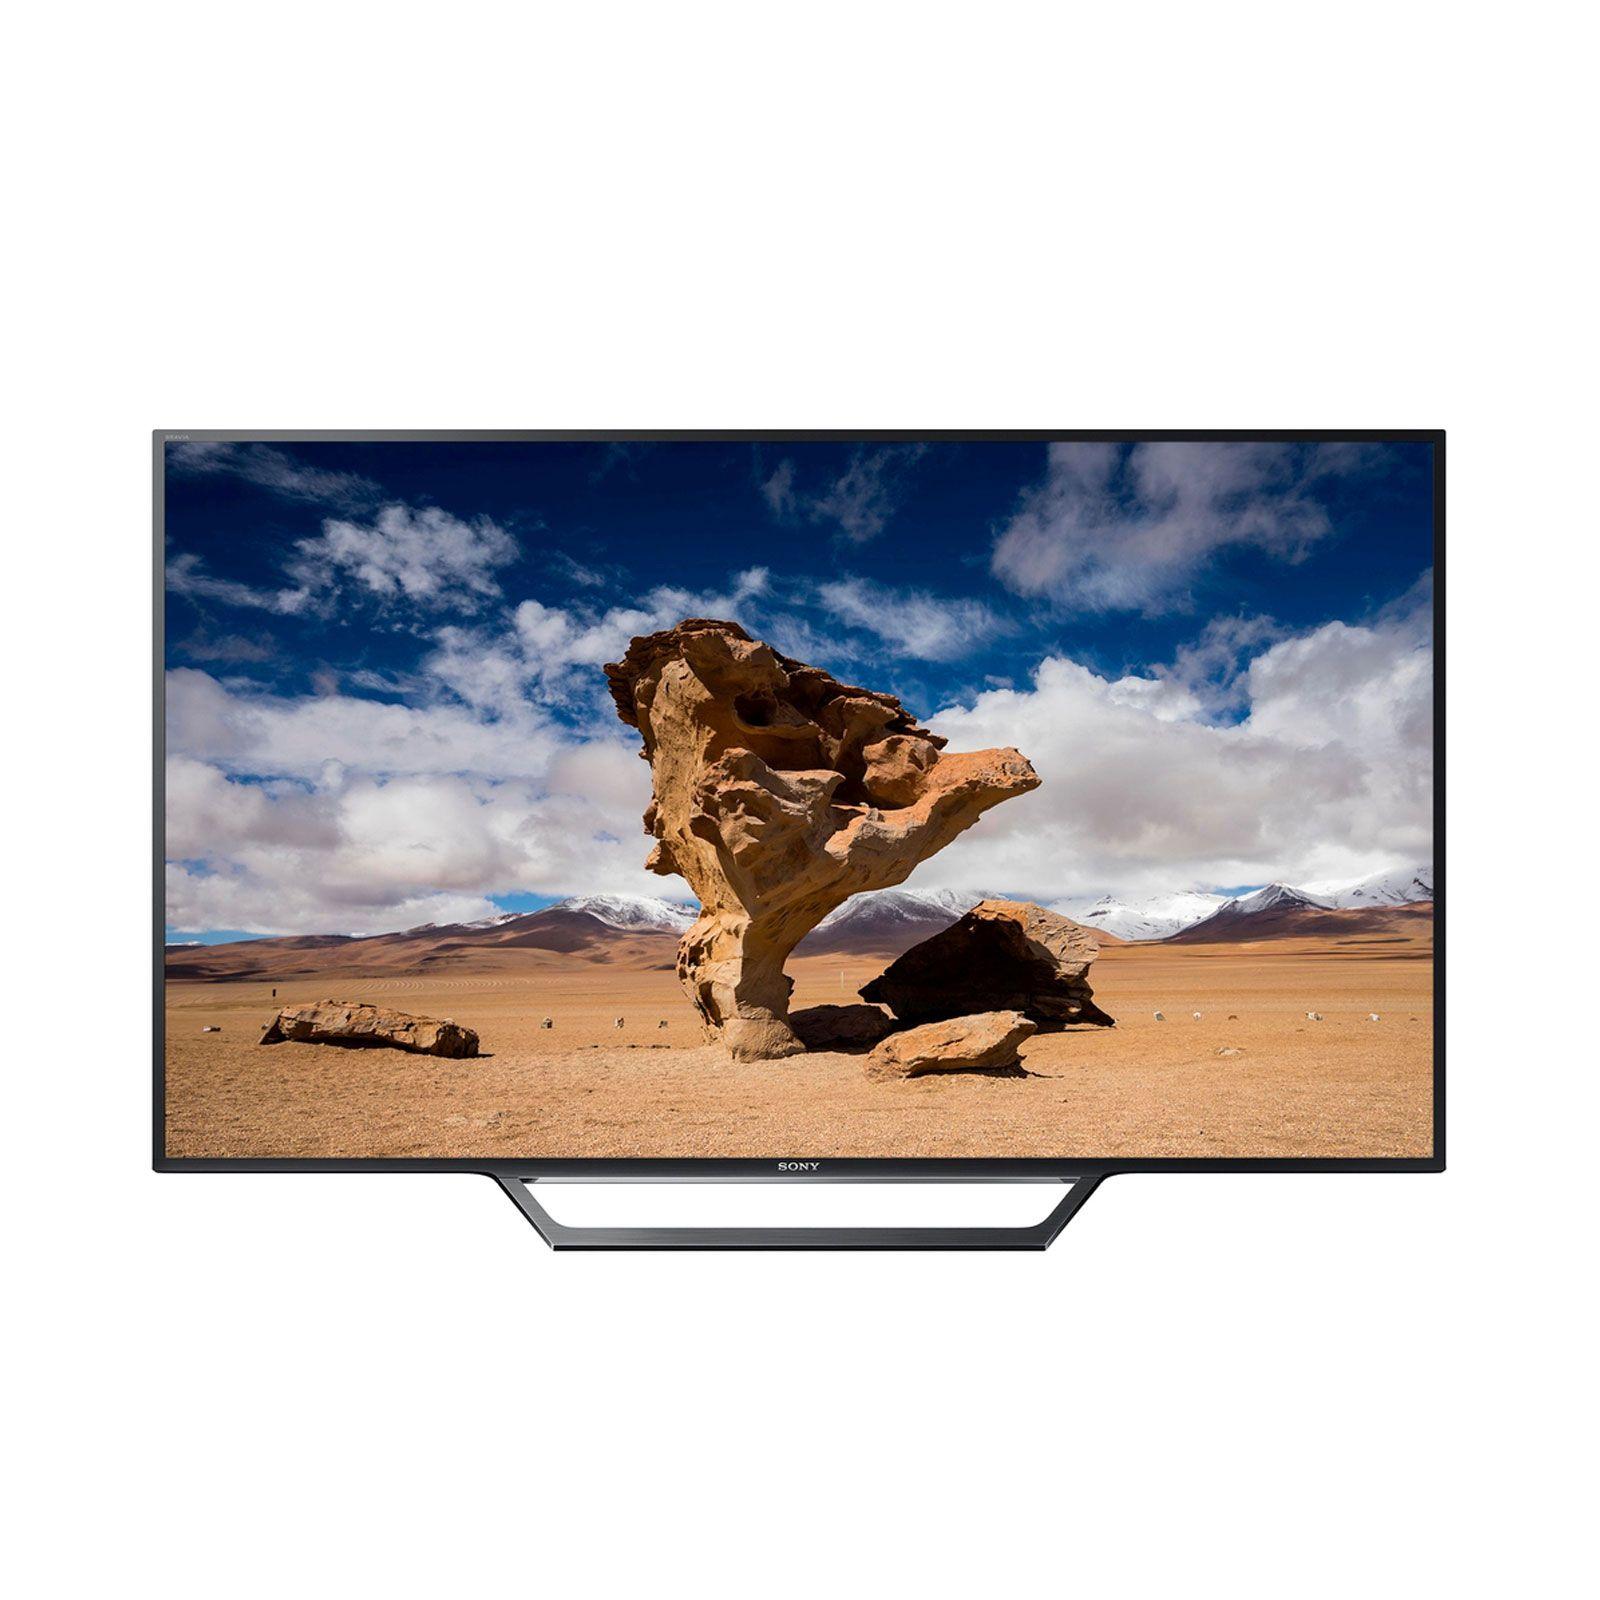 Sony KDL-40W650D Smart LED TV